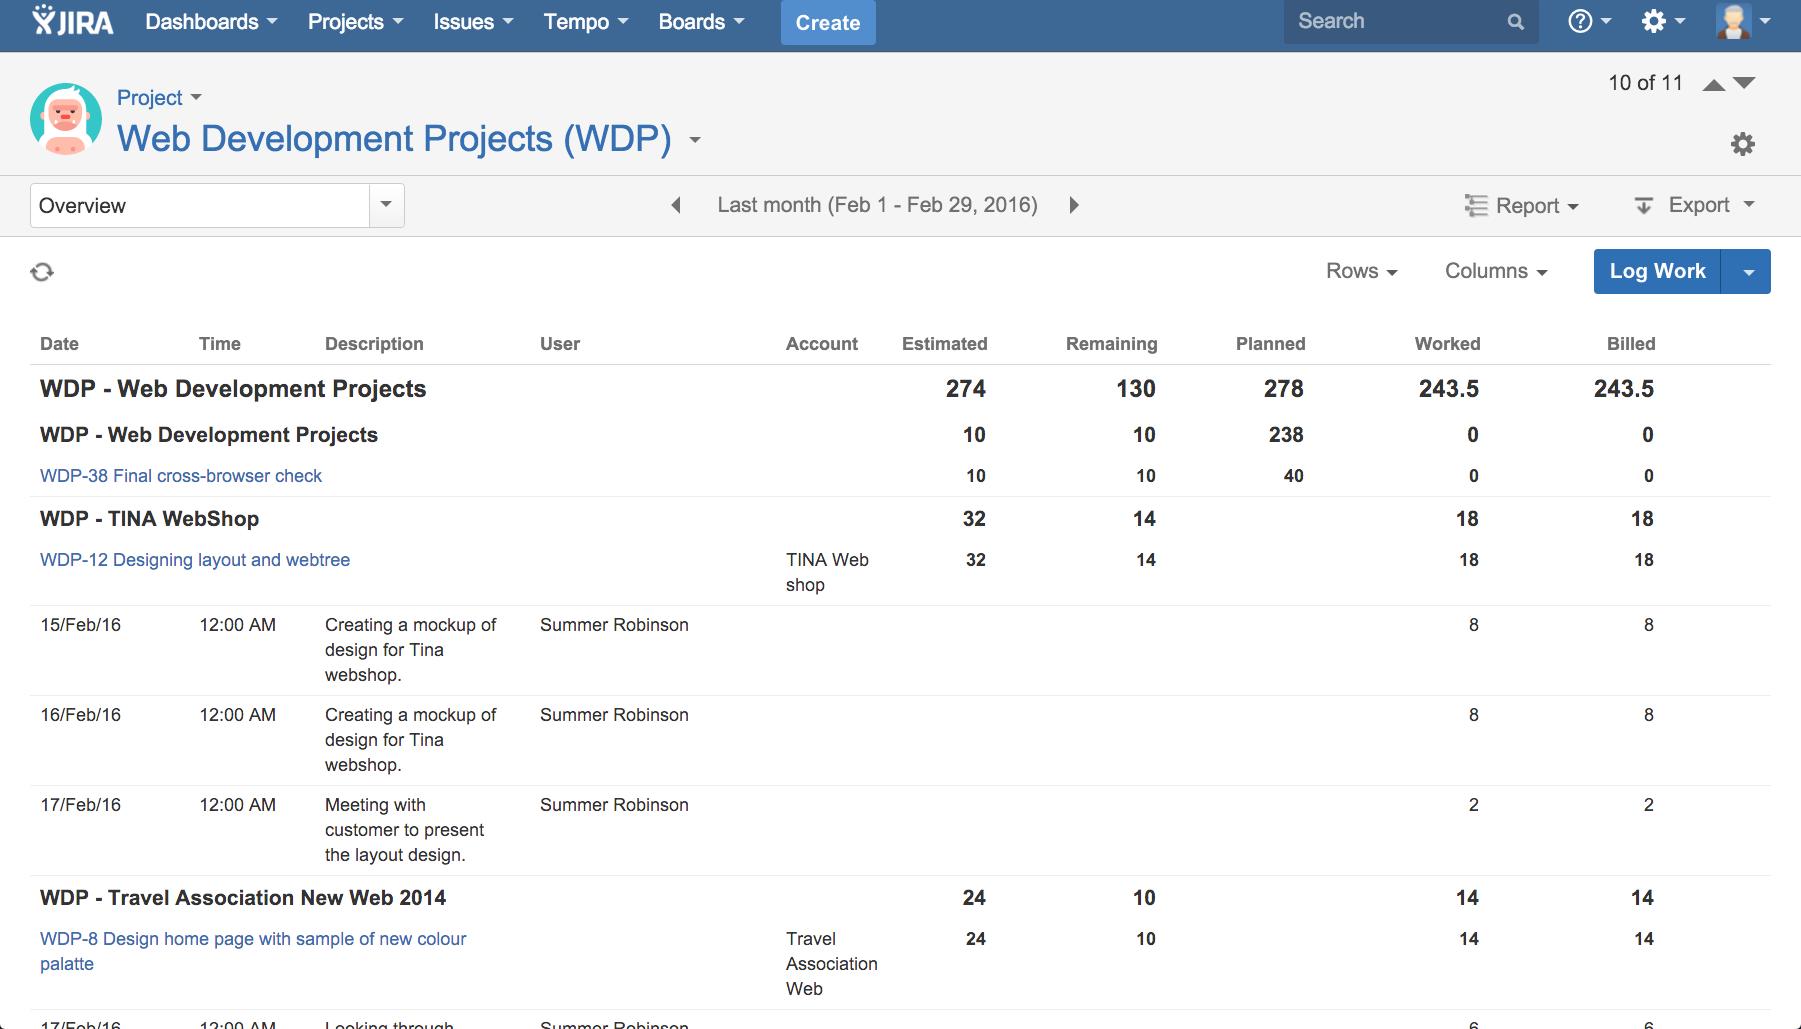 projectreport